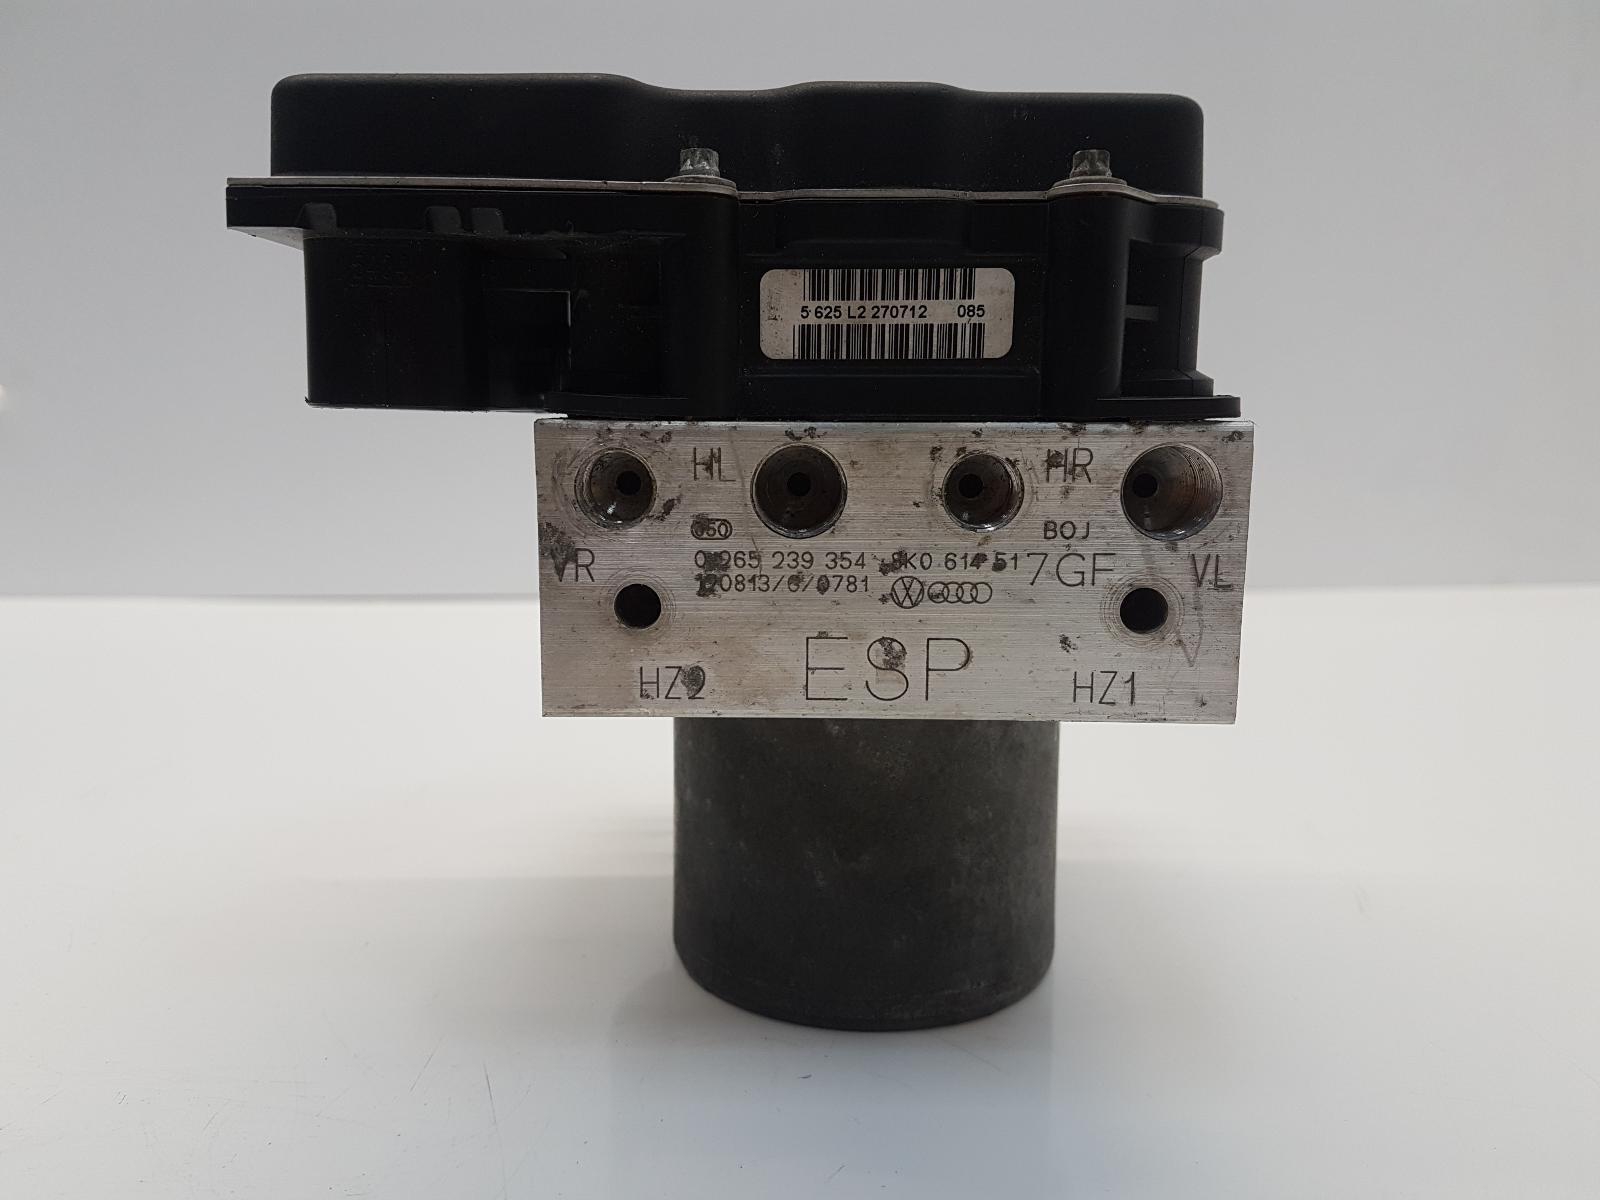 View Auto part ABS Pump/Modulator AUDI A4 2012